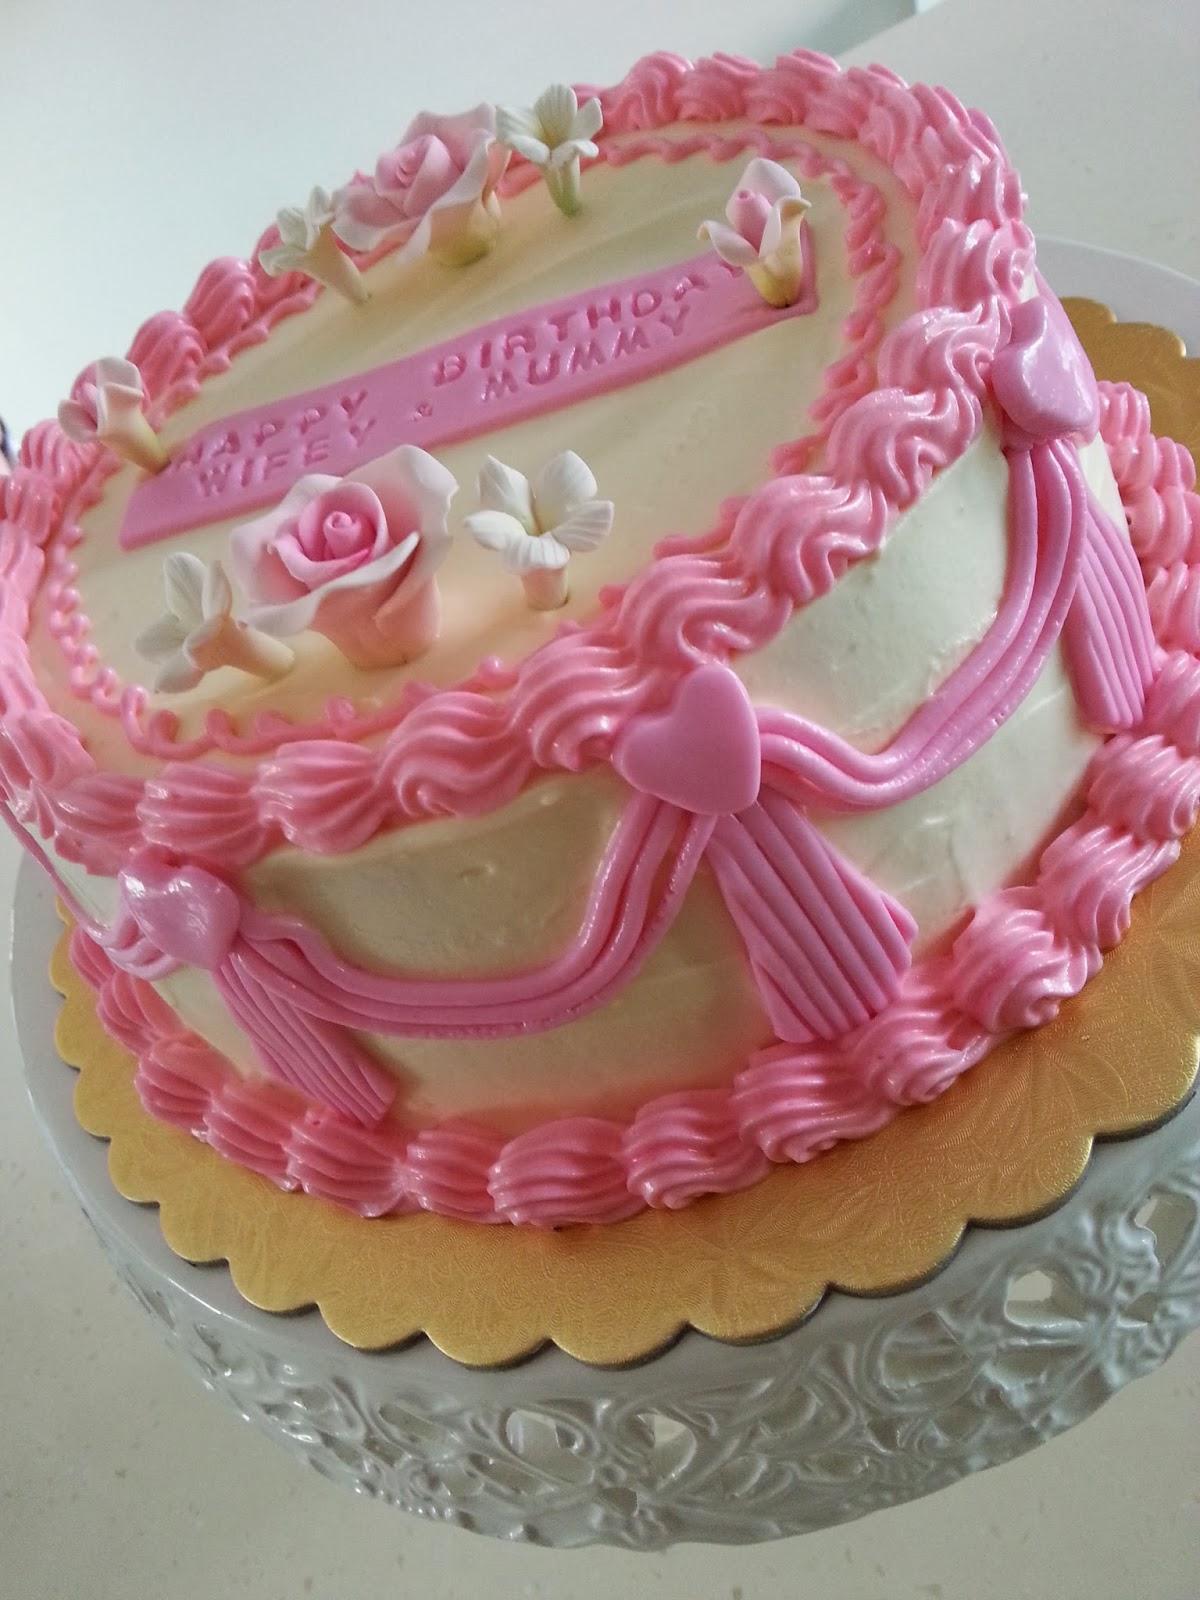 Birthday Cake Images With Name Pinky : Zeti Hot Oven: 365 Hot Oven - Pinky Birthday Cake